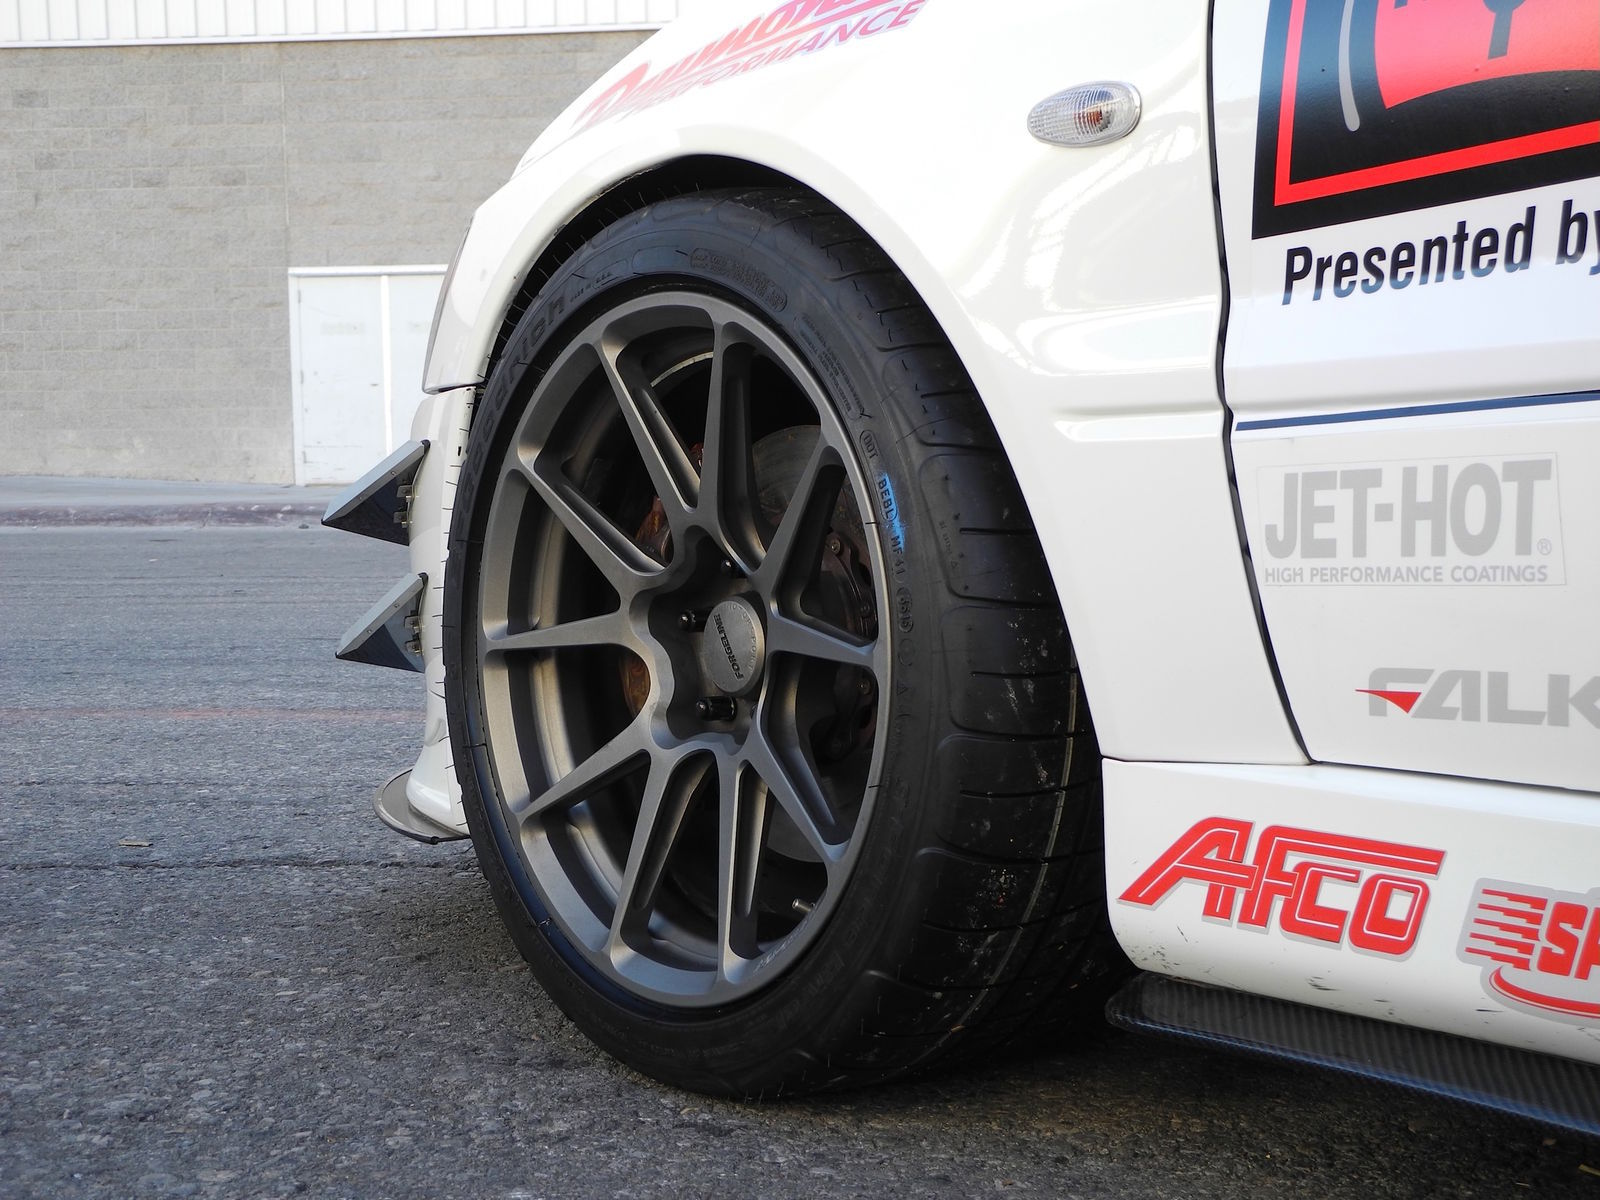 2006 Mitsubishi Lancer Evolution | Showtime Motorsports Evo on Forgeline GA1R Open Lug Wheels - Close Up Wheel Shot